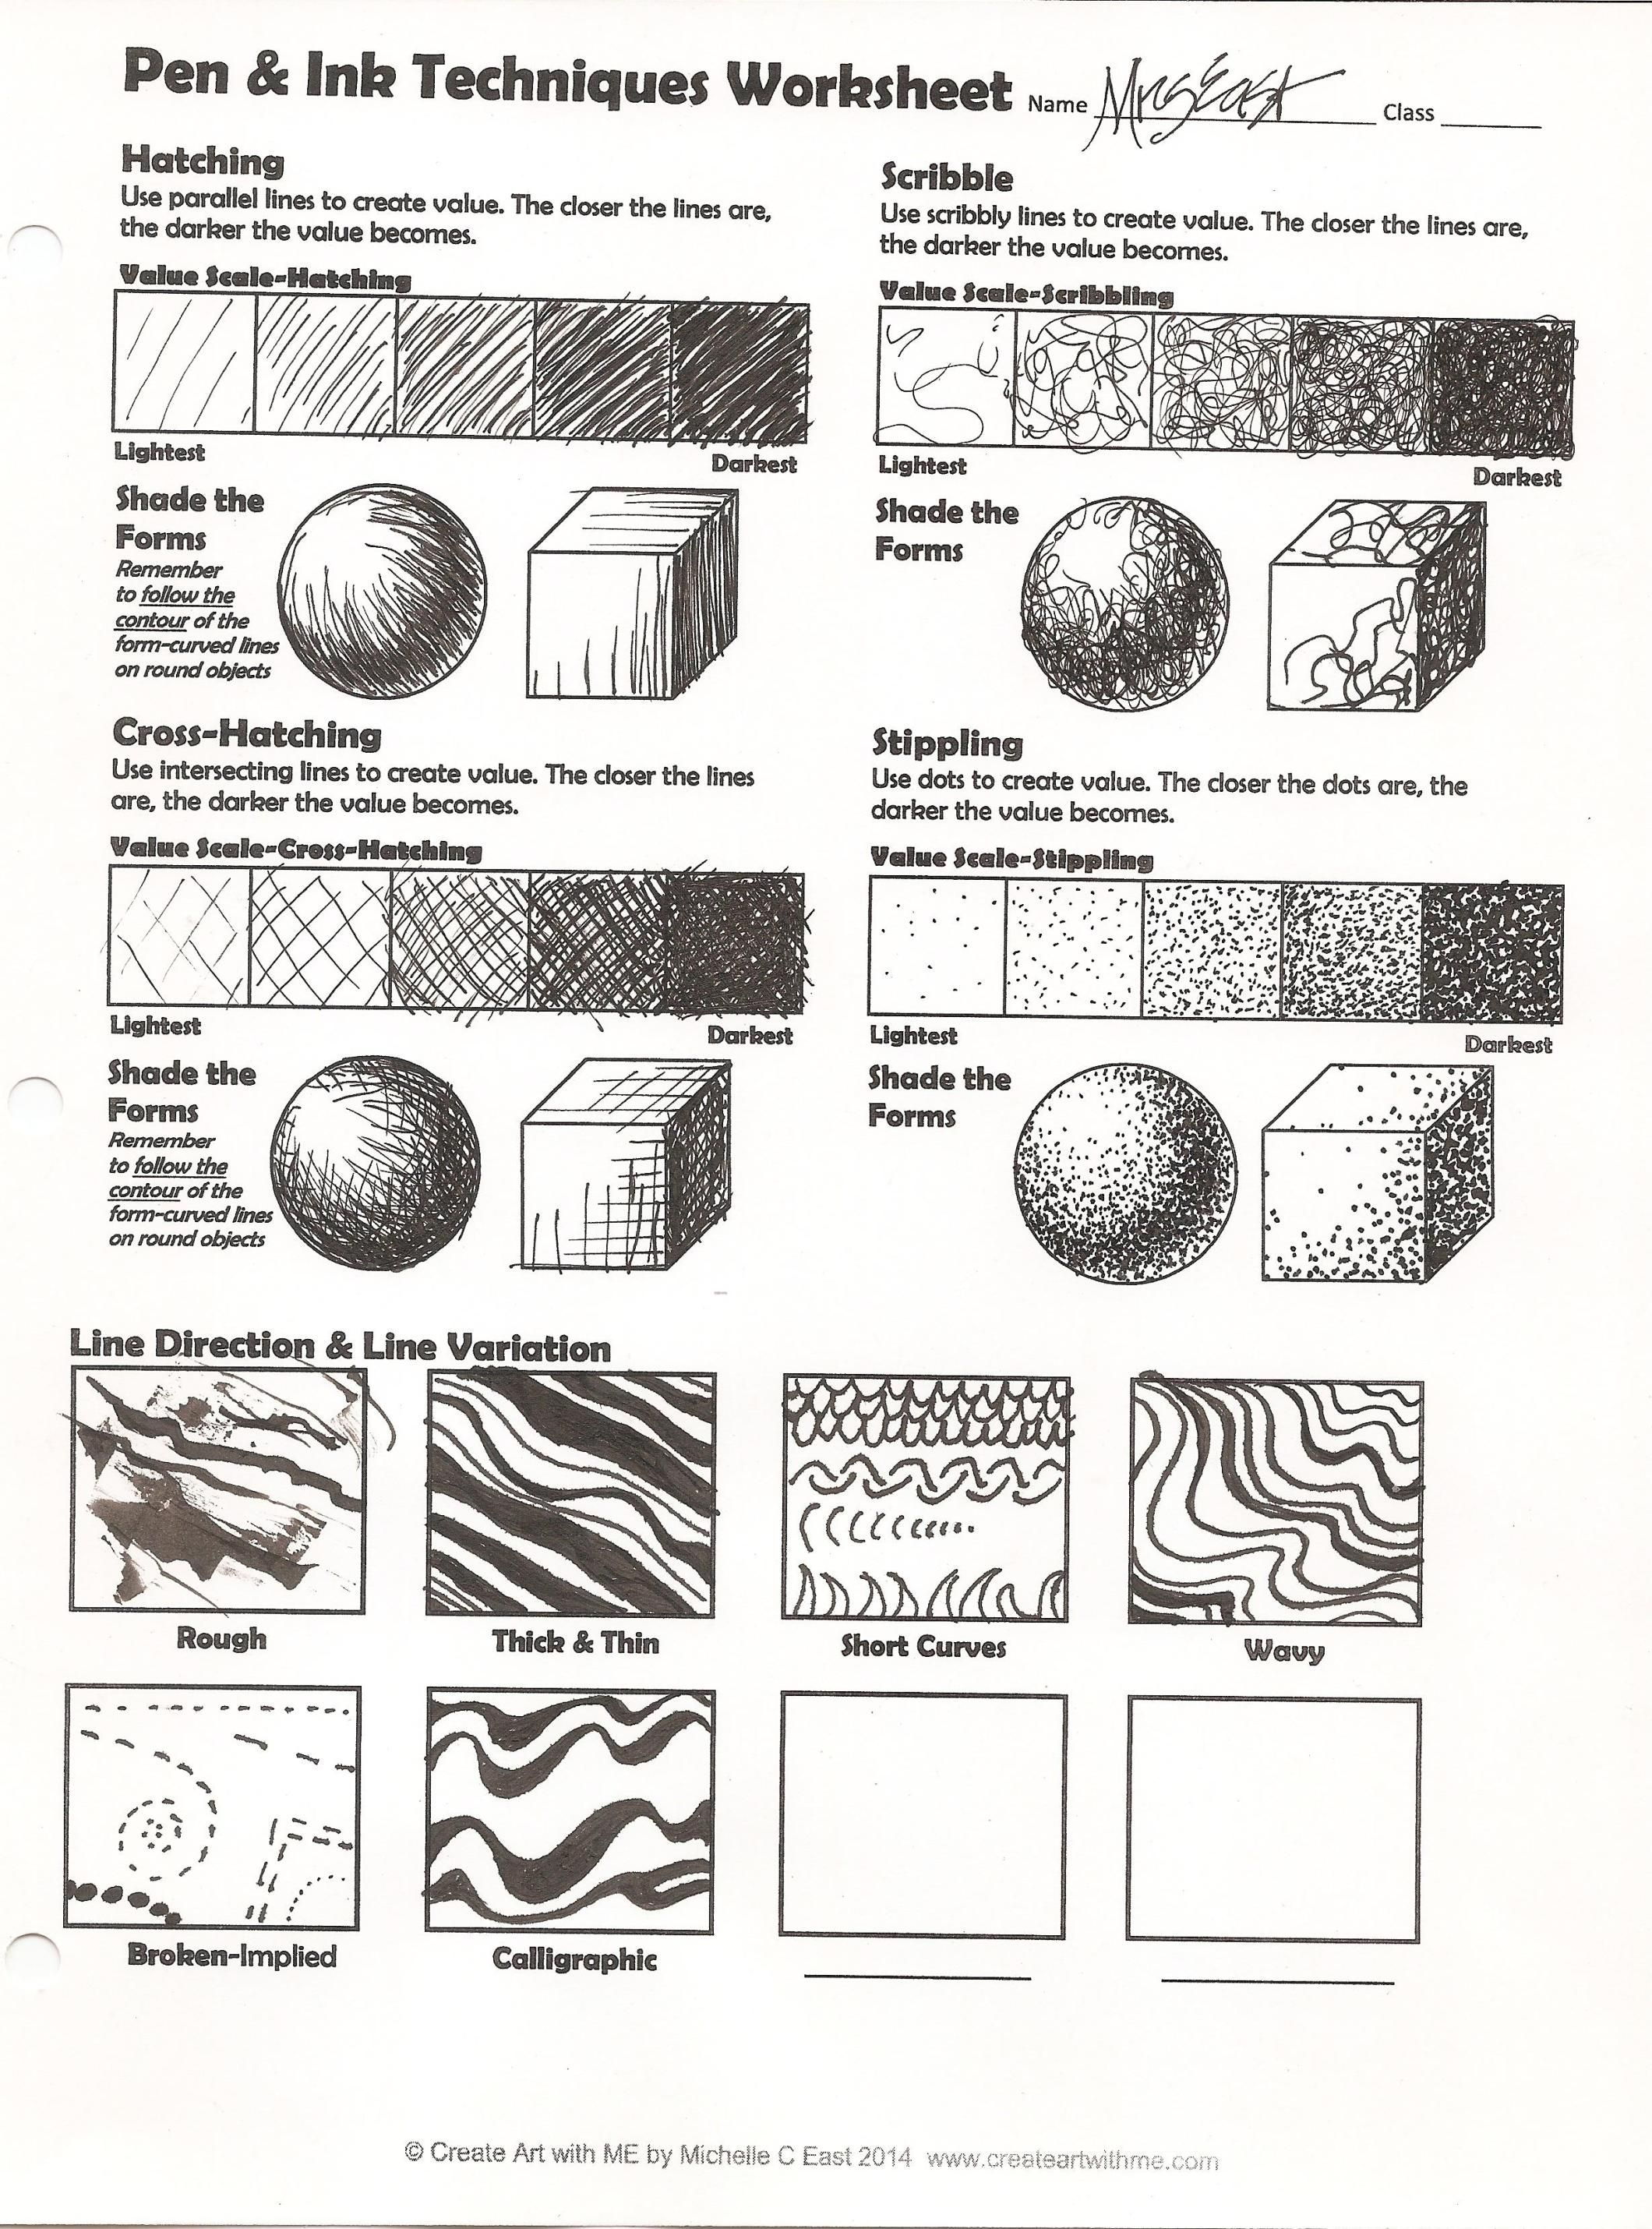 pen ink techniques lesson plan worksheet teaching in 2019 art worksheets drawings. Black Bedroom Furniture Sets. Home Design Ideas